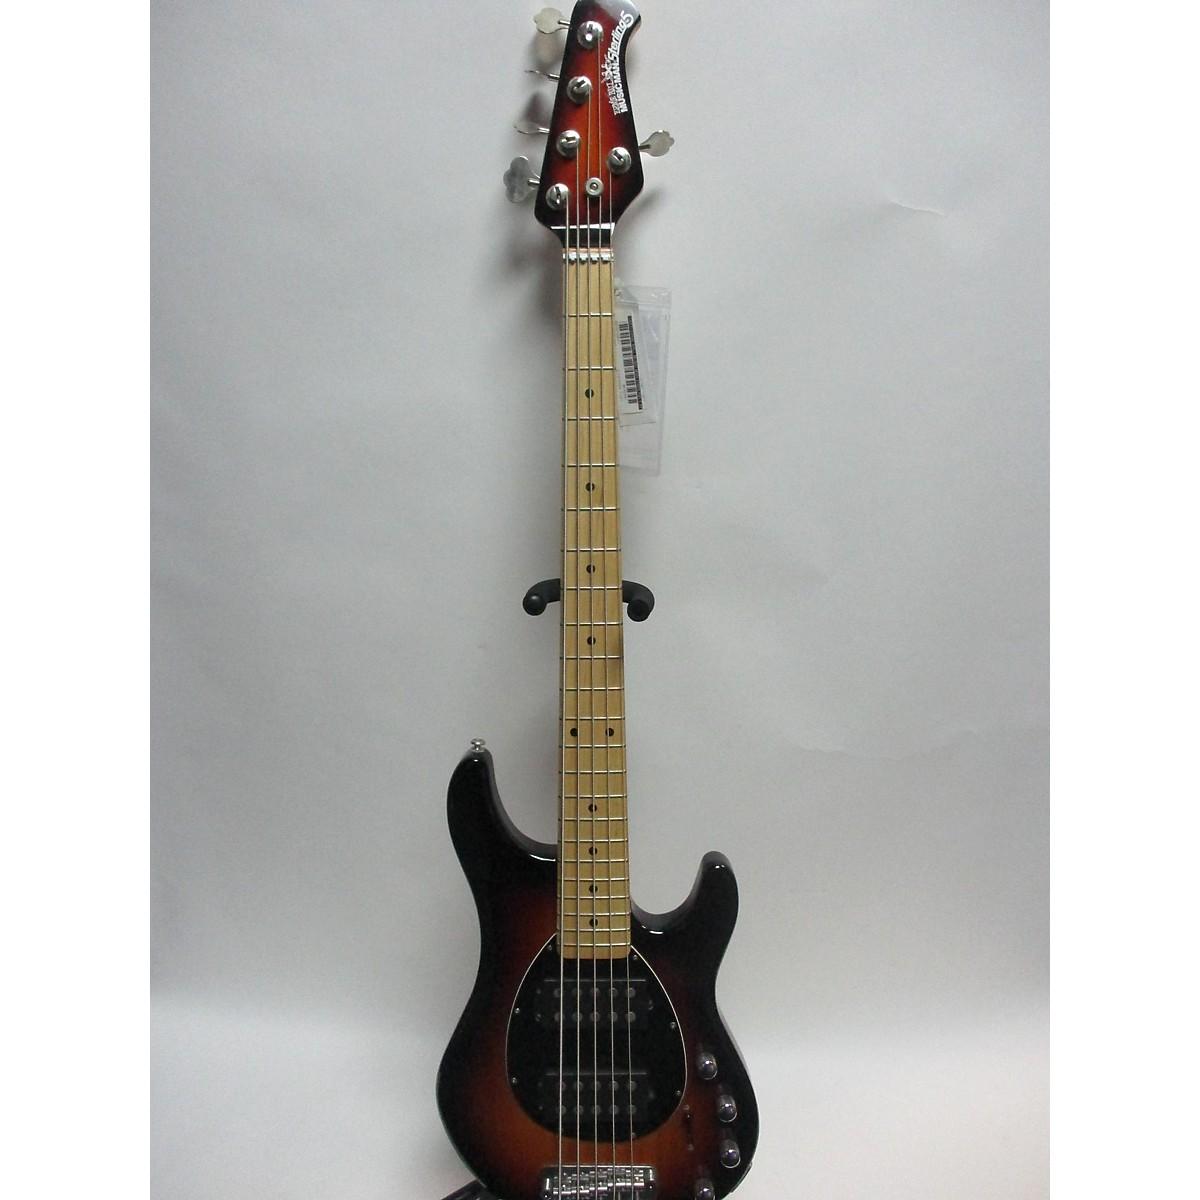 Ernie Ball Music Man Sterling 5 String Electric Bass Guitar